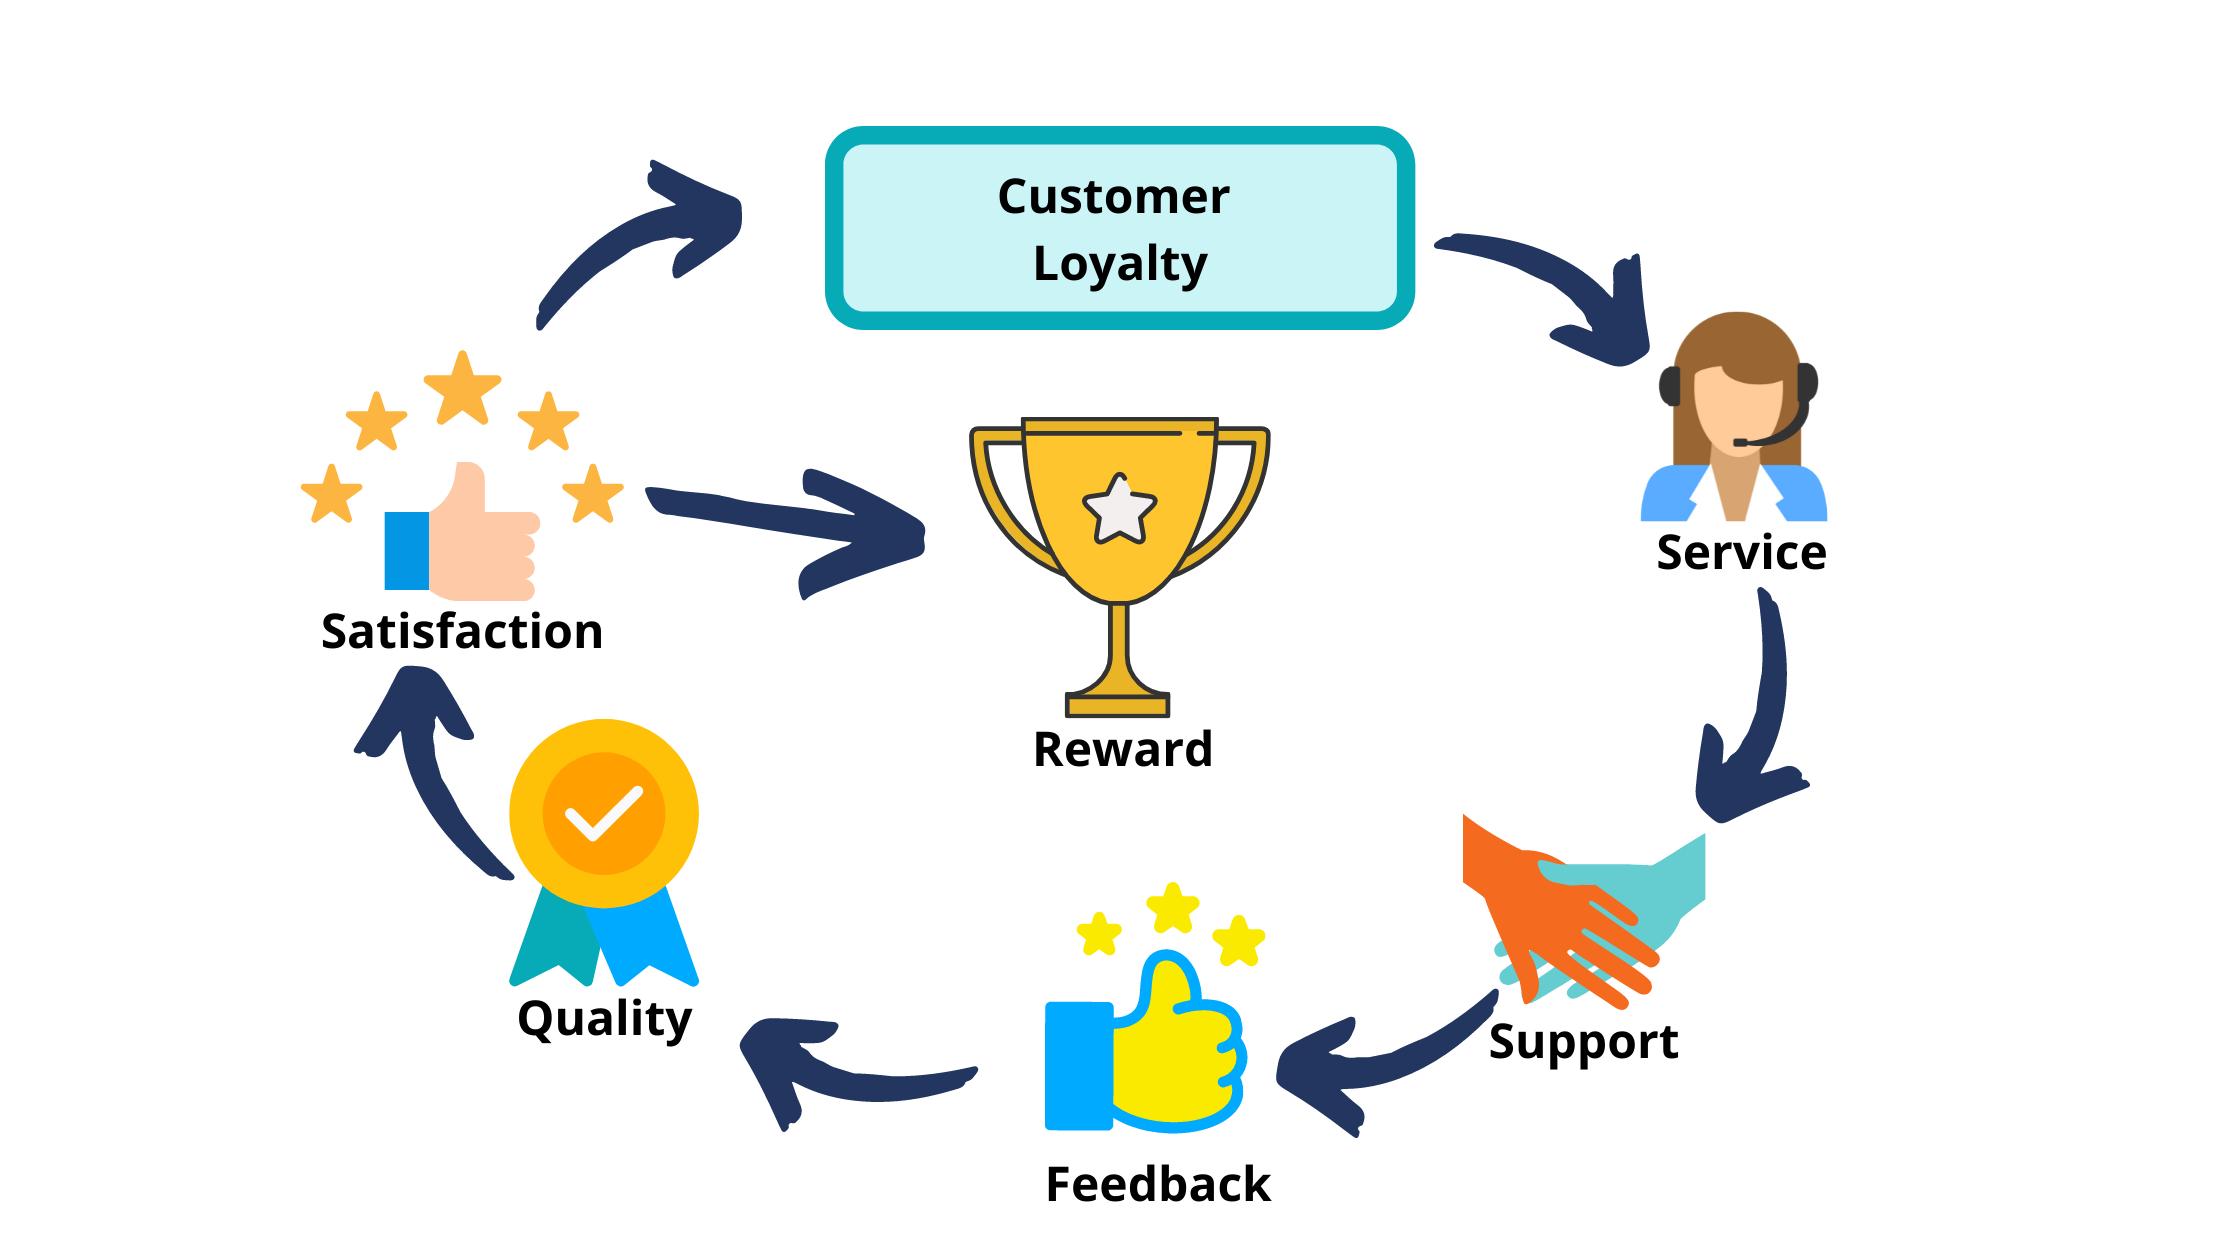 Customer loyalty dimensions